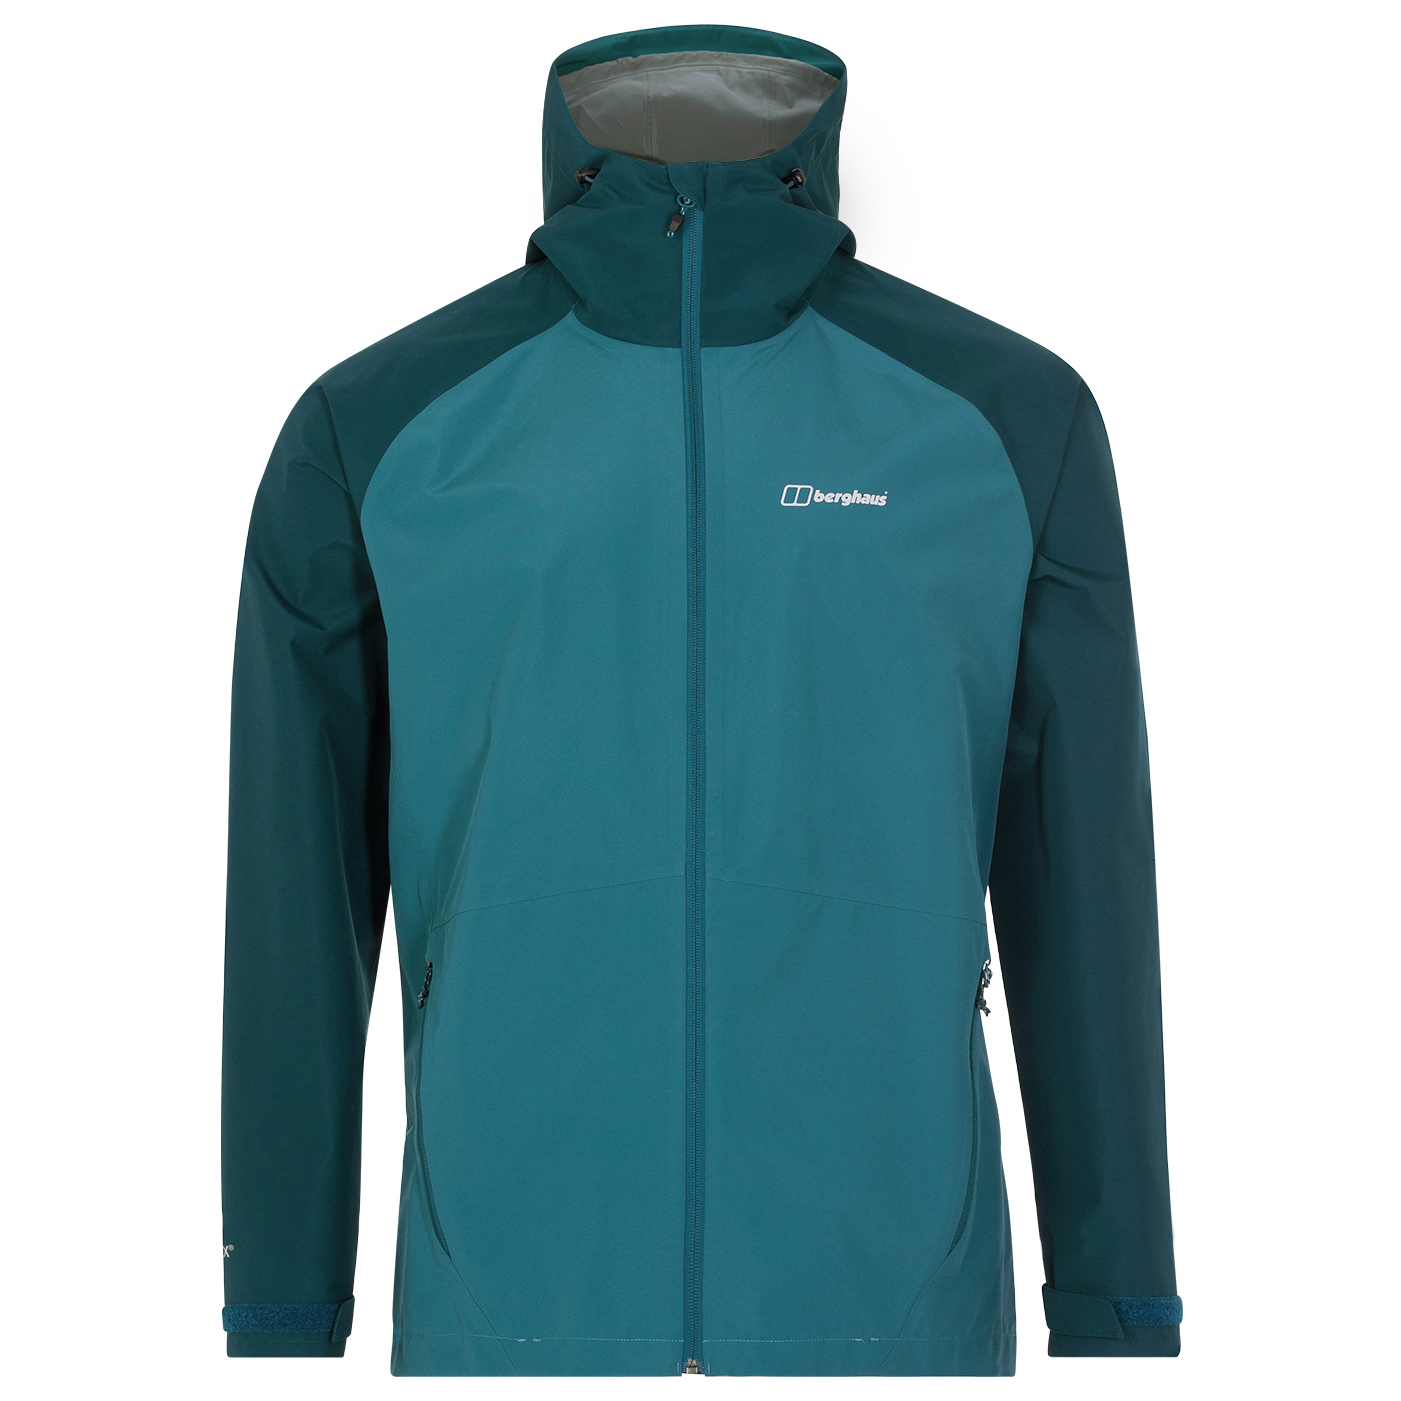 brand new release date 100% high quality Berghaus Paclite 2.0 Shell Jacket - Waterproof jacket Men's ...